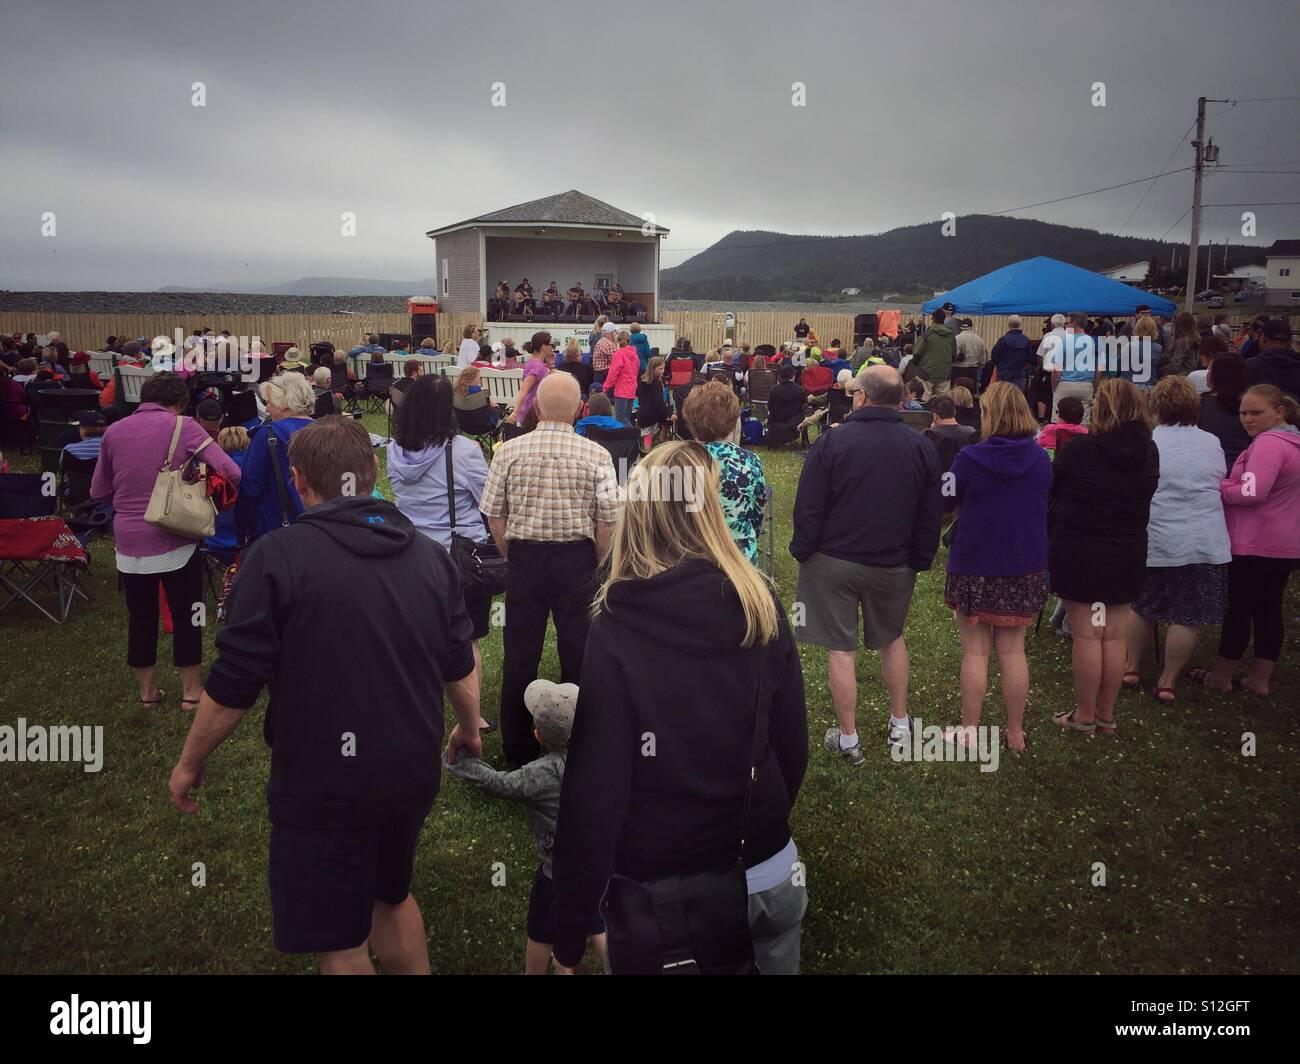 Southern Shore Shamrock Folk Festival in Ferryland, Newfoundland, Canada. - Stock Image